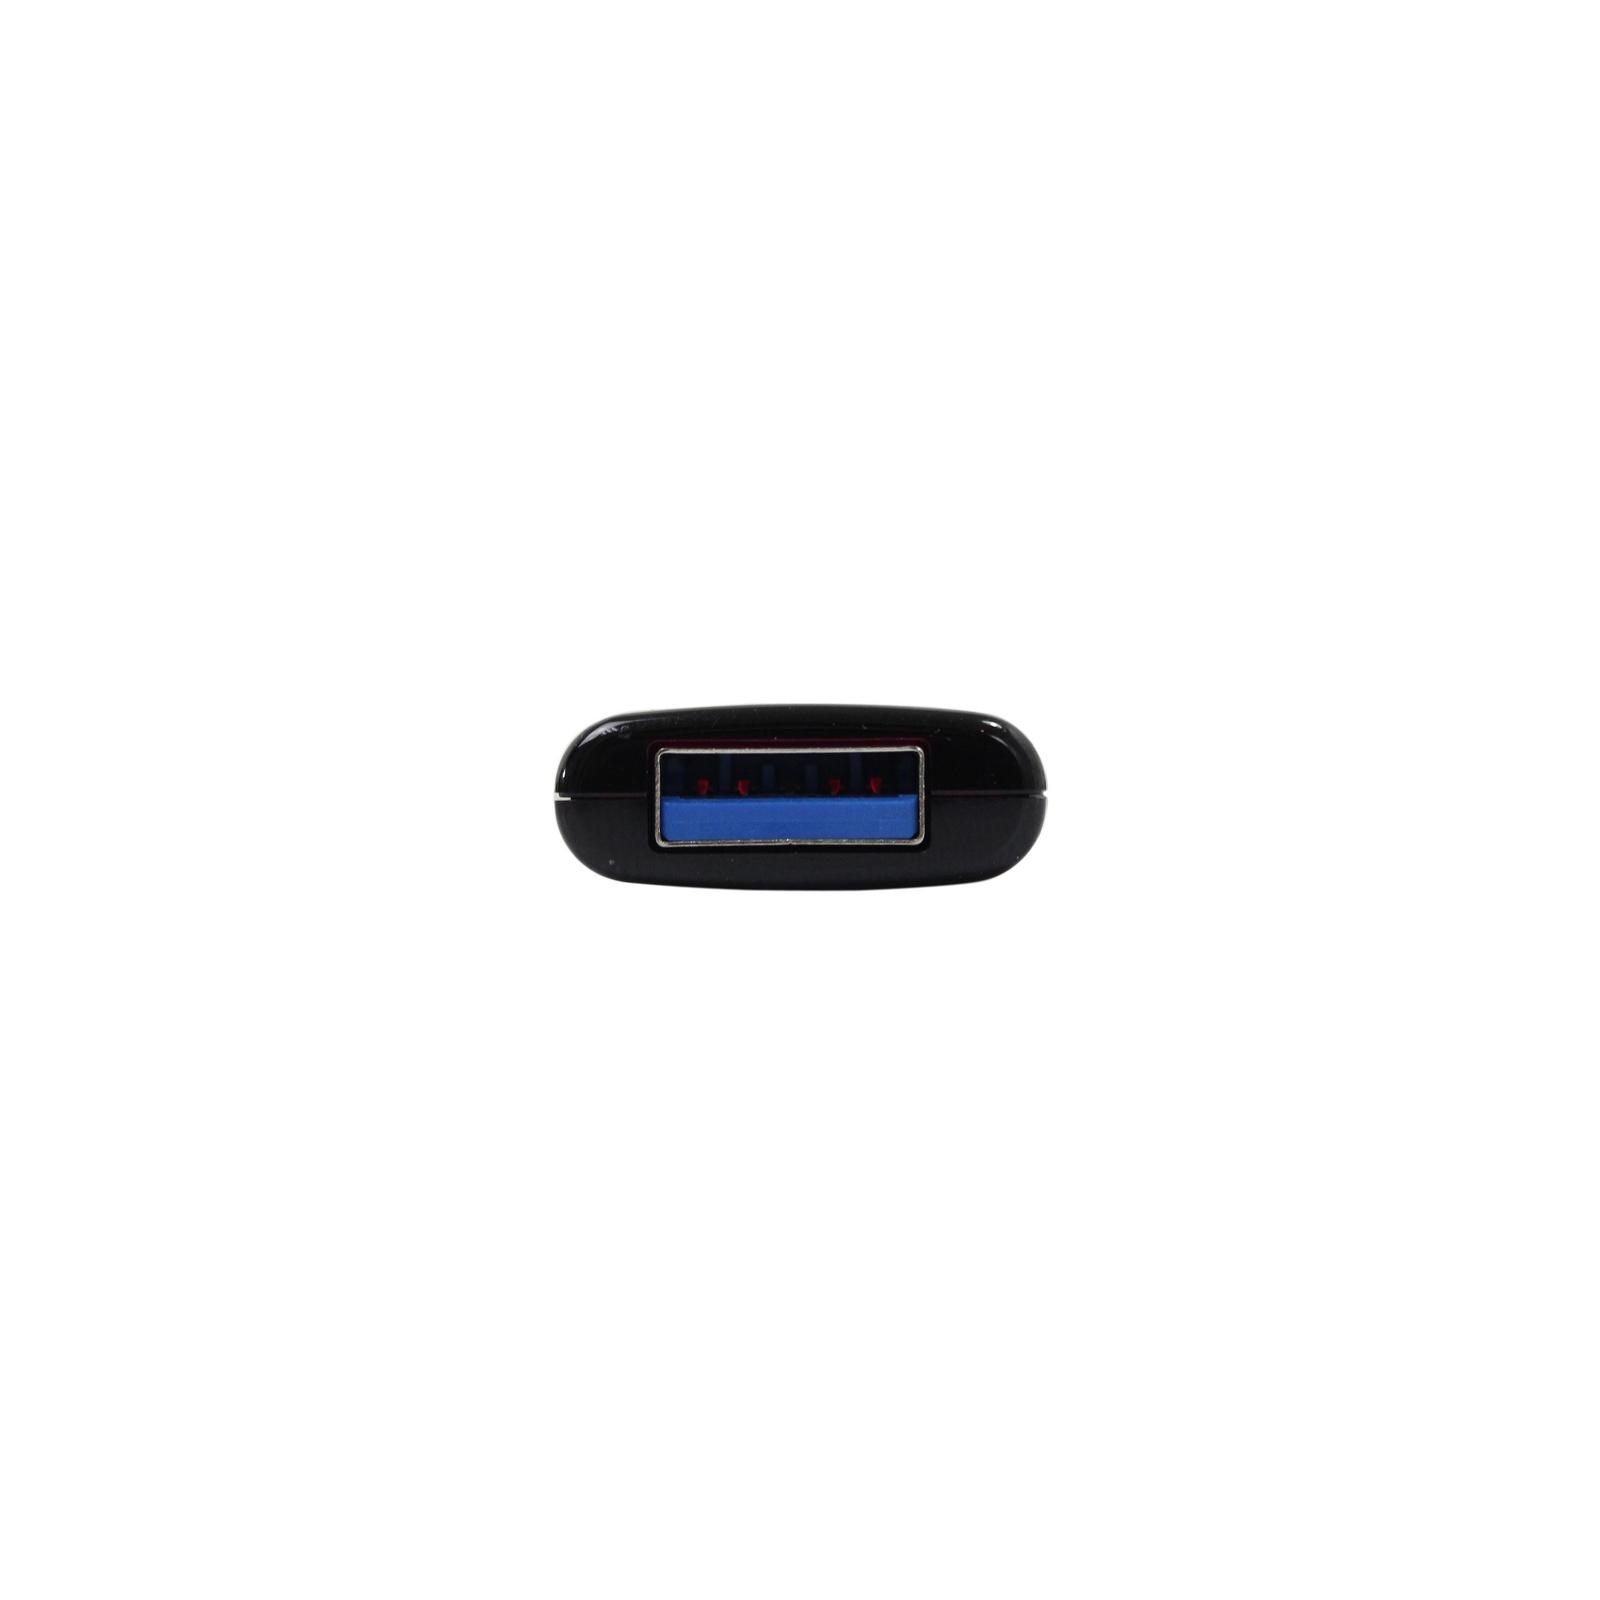 USB флеш накопитель 32GB AH351 Red RP USB3.0 Apacer (AP32GAH351R-1) изображение 8